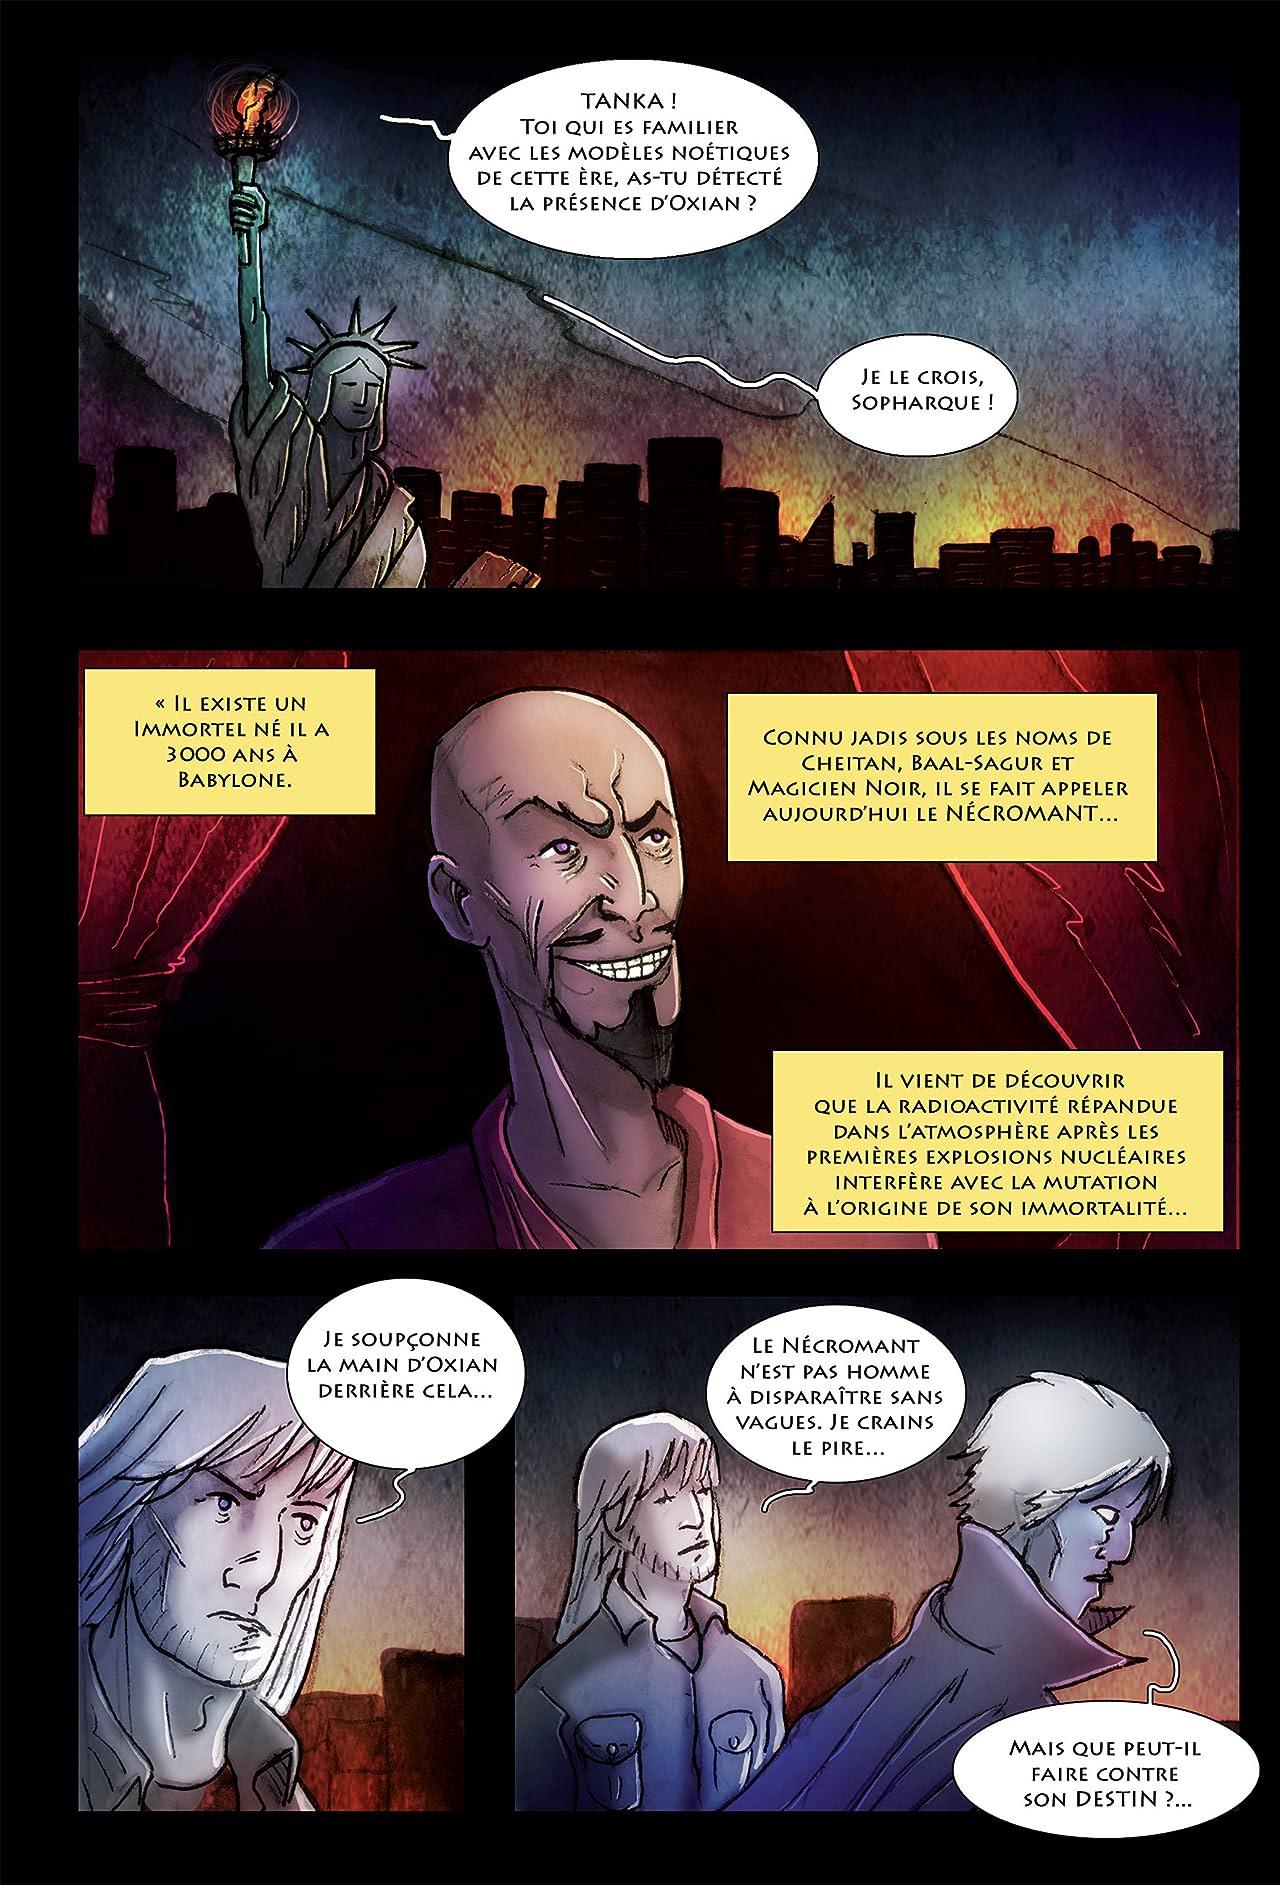 STRANGERS SEASON 0 Vol. 3: Le Retour de Starlock